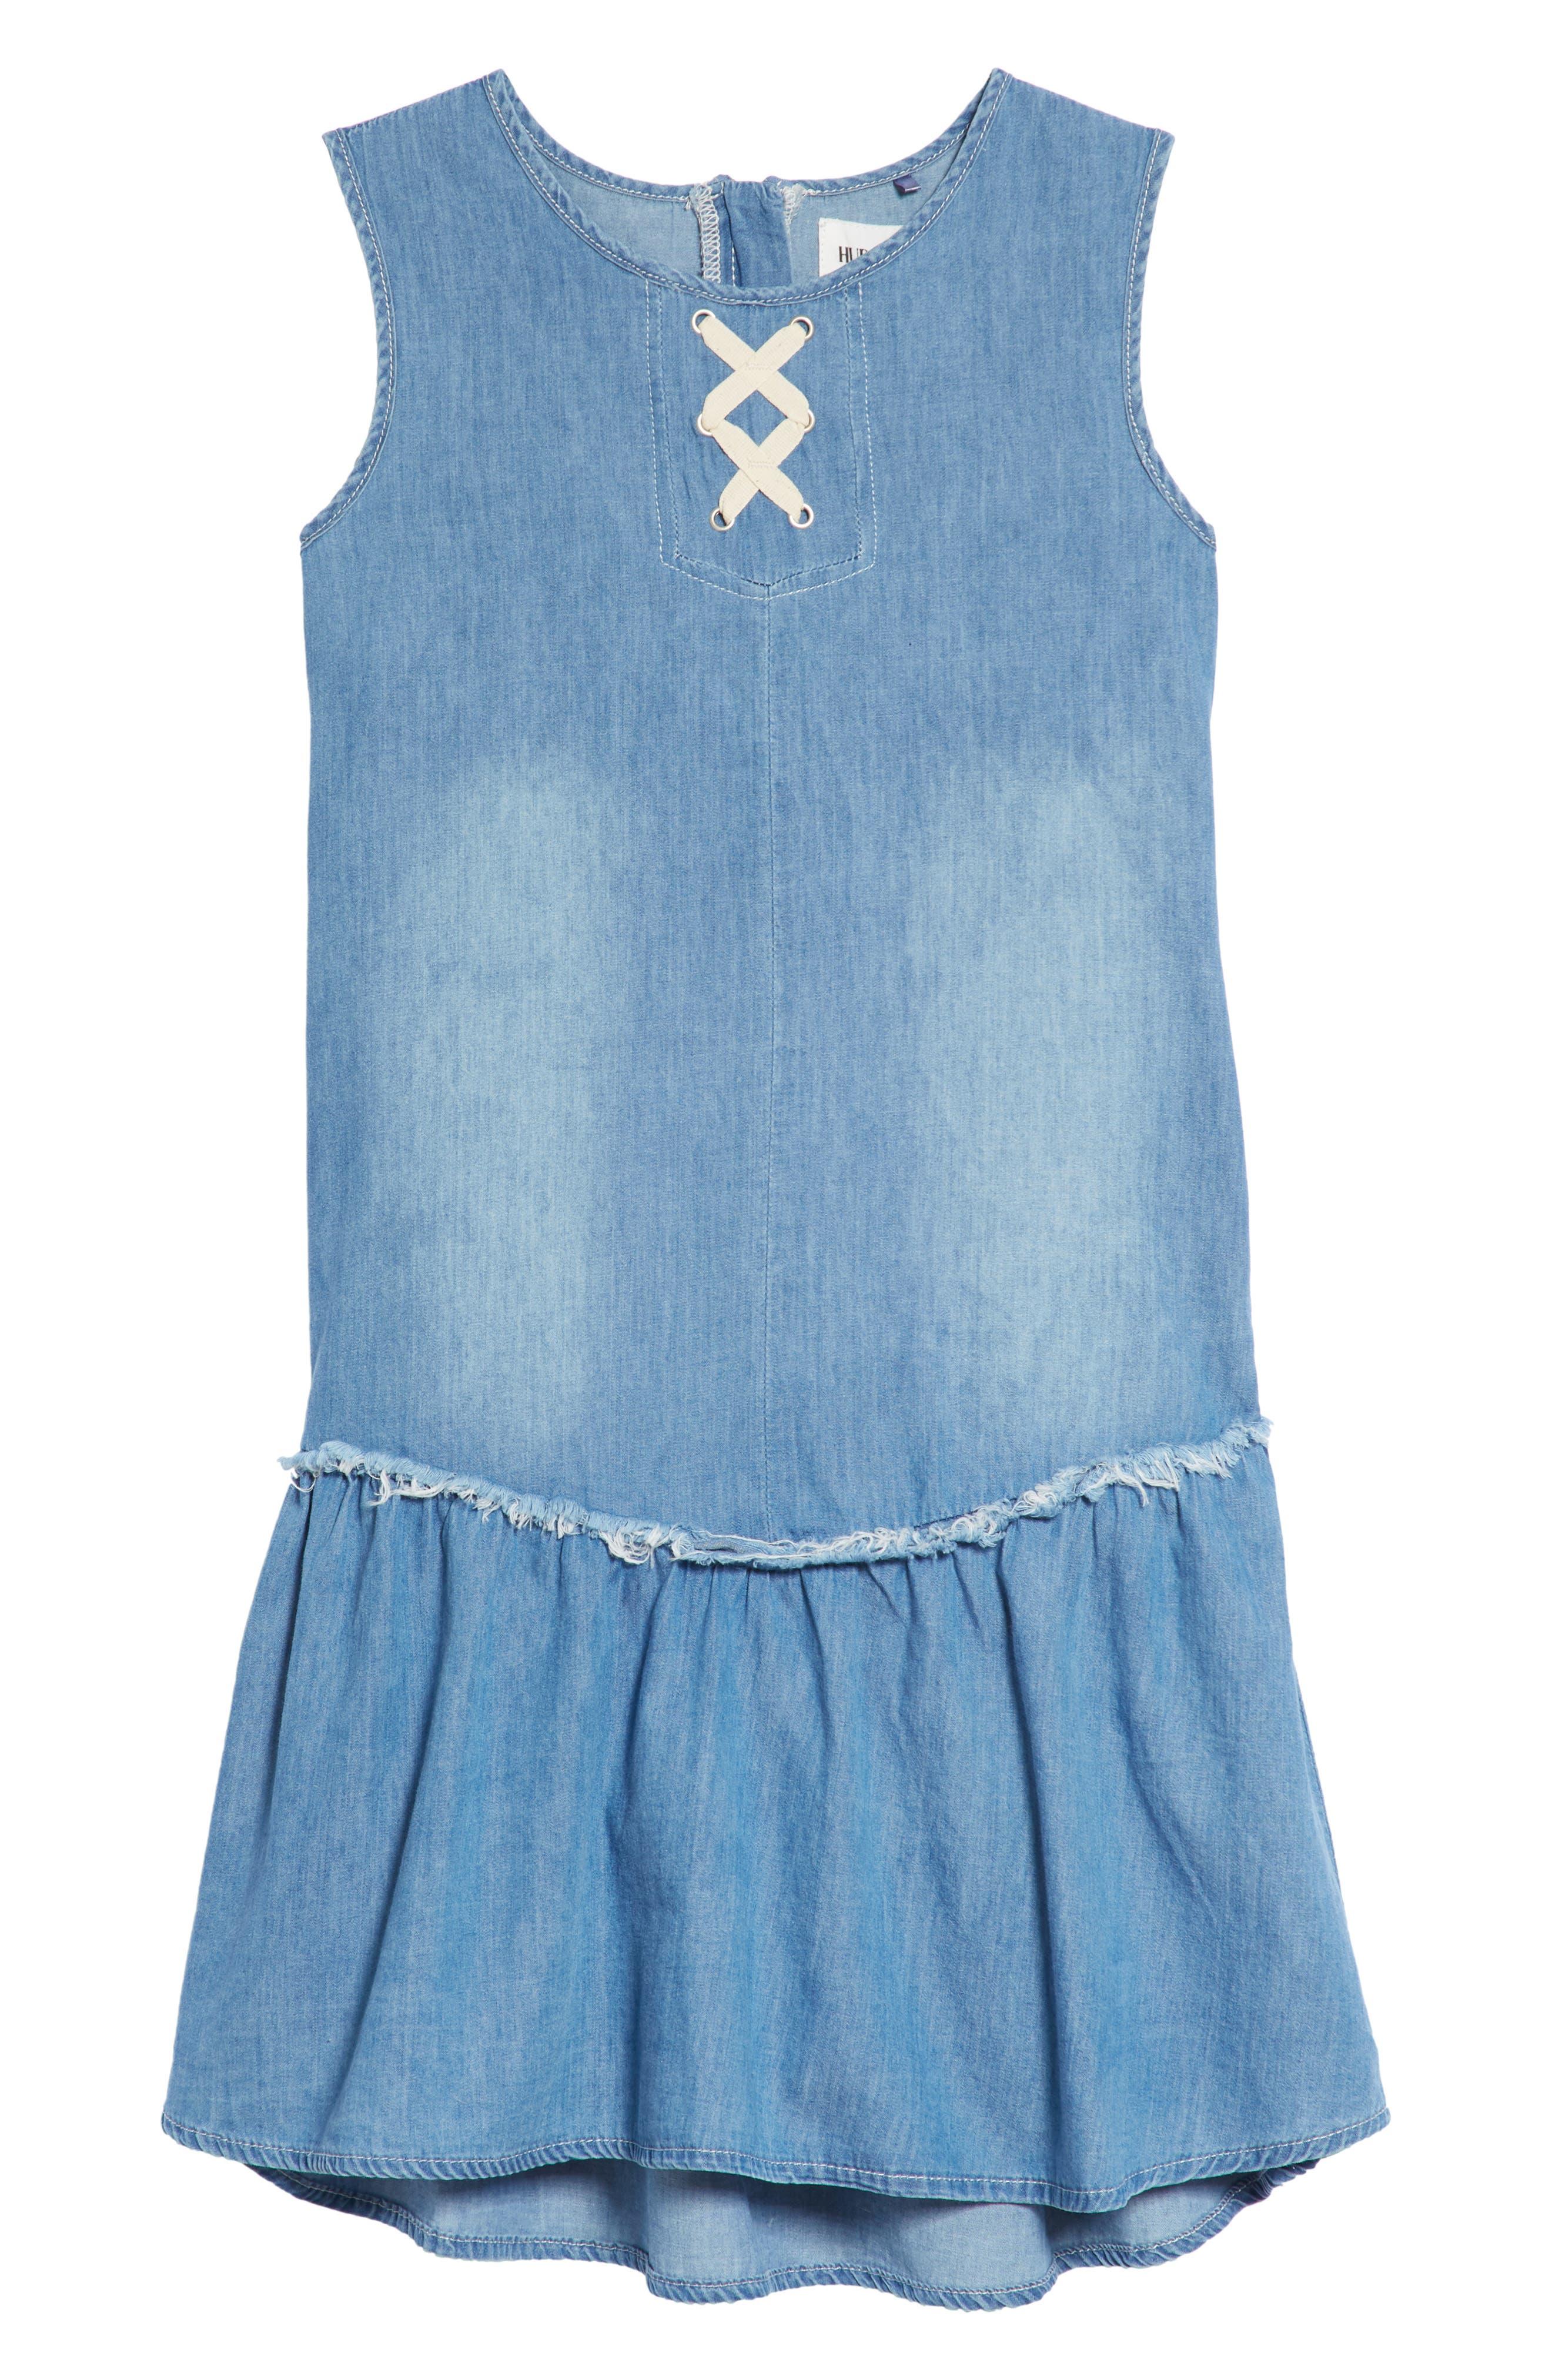 Lulu Lace-Up Chambray Dress,                         Main,                         color, Light Blue